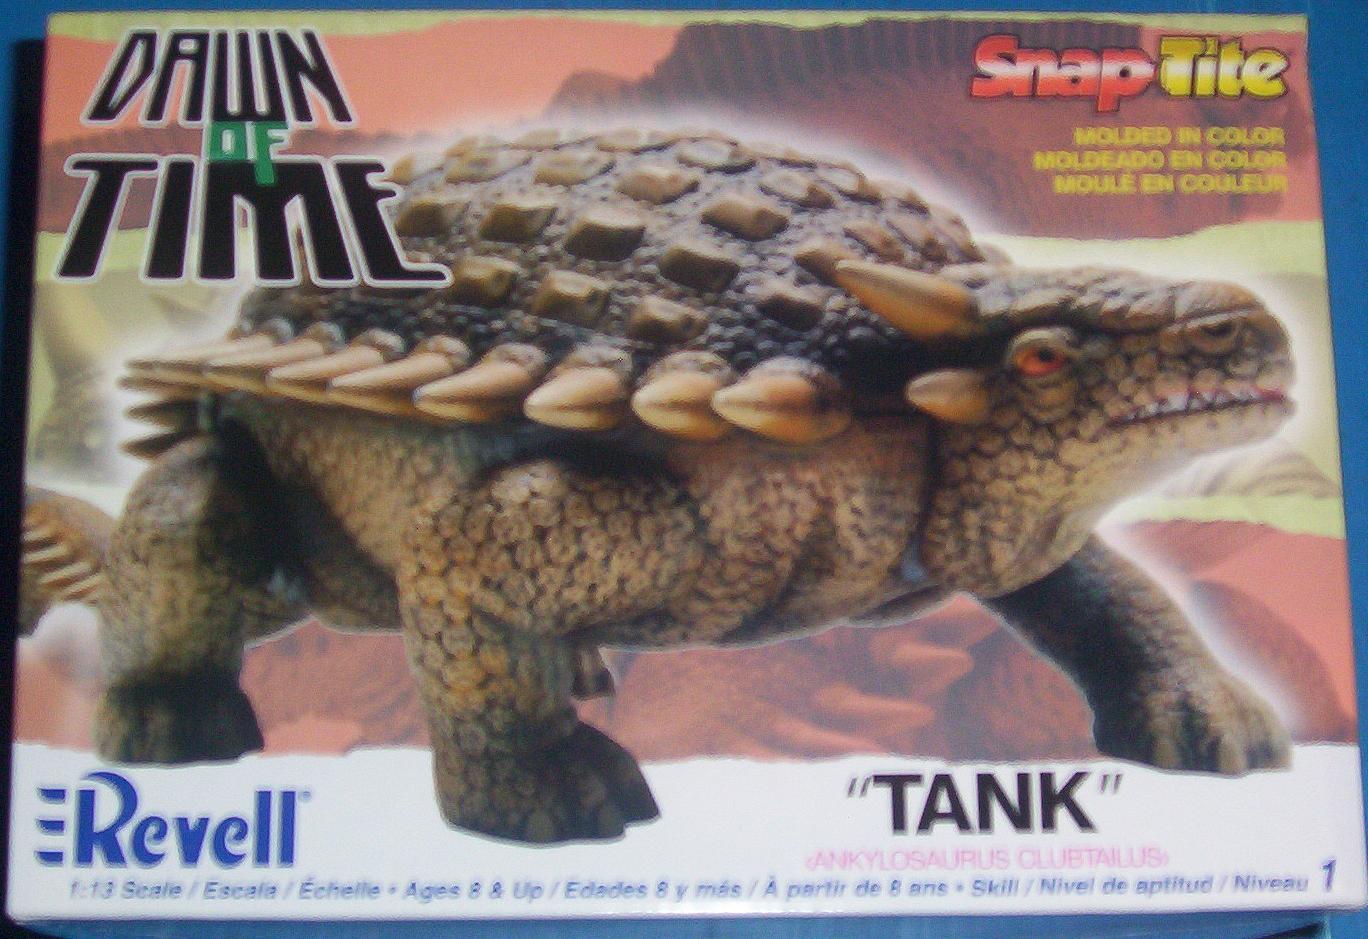 Revell 07 Armored dinosaur model box